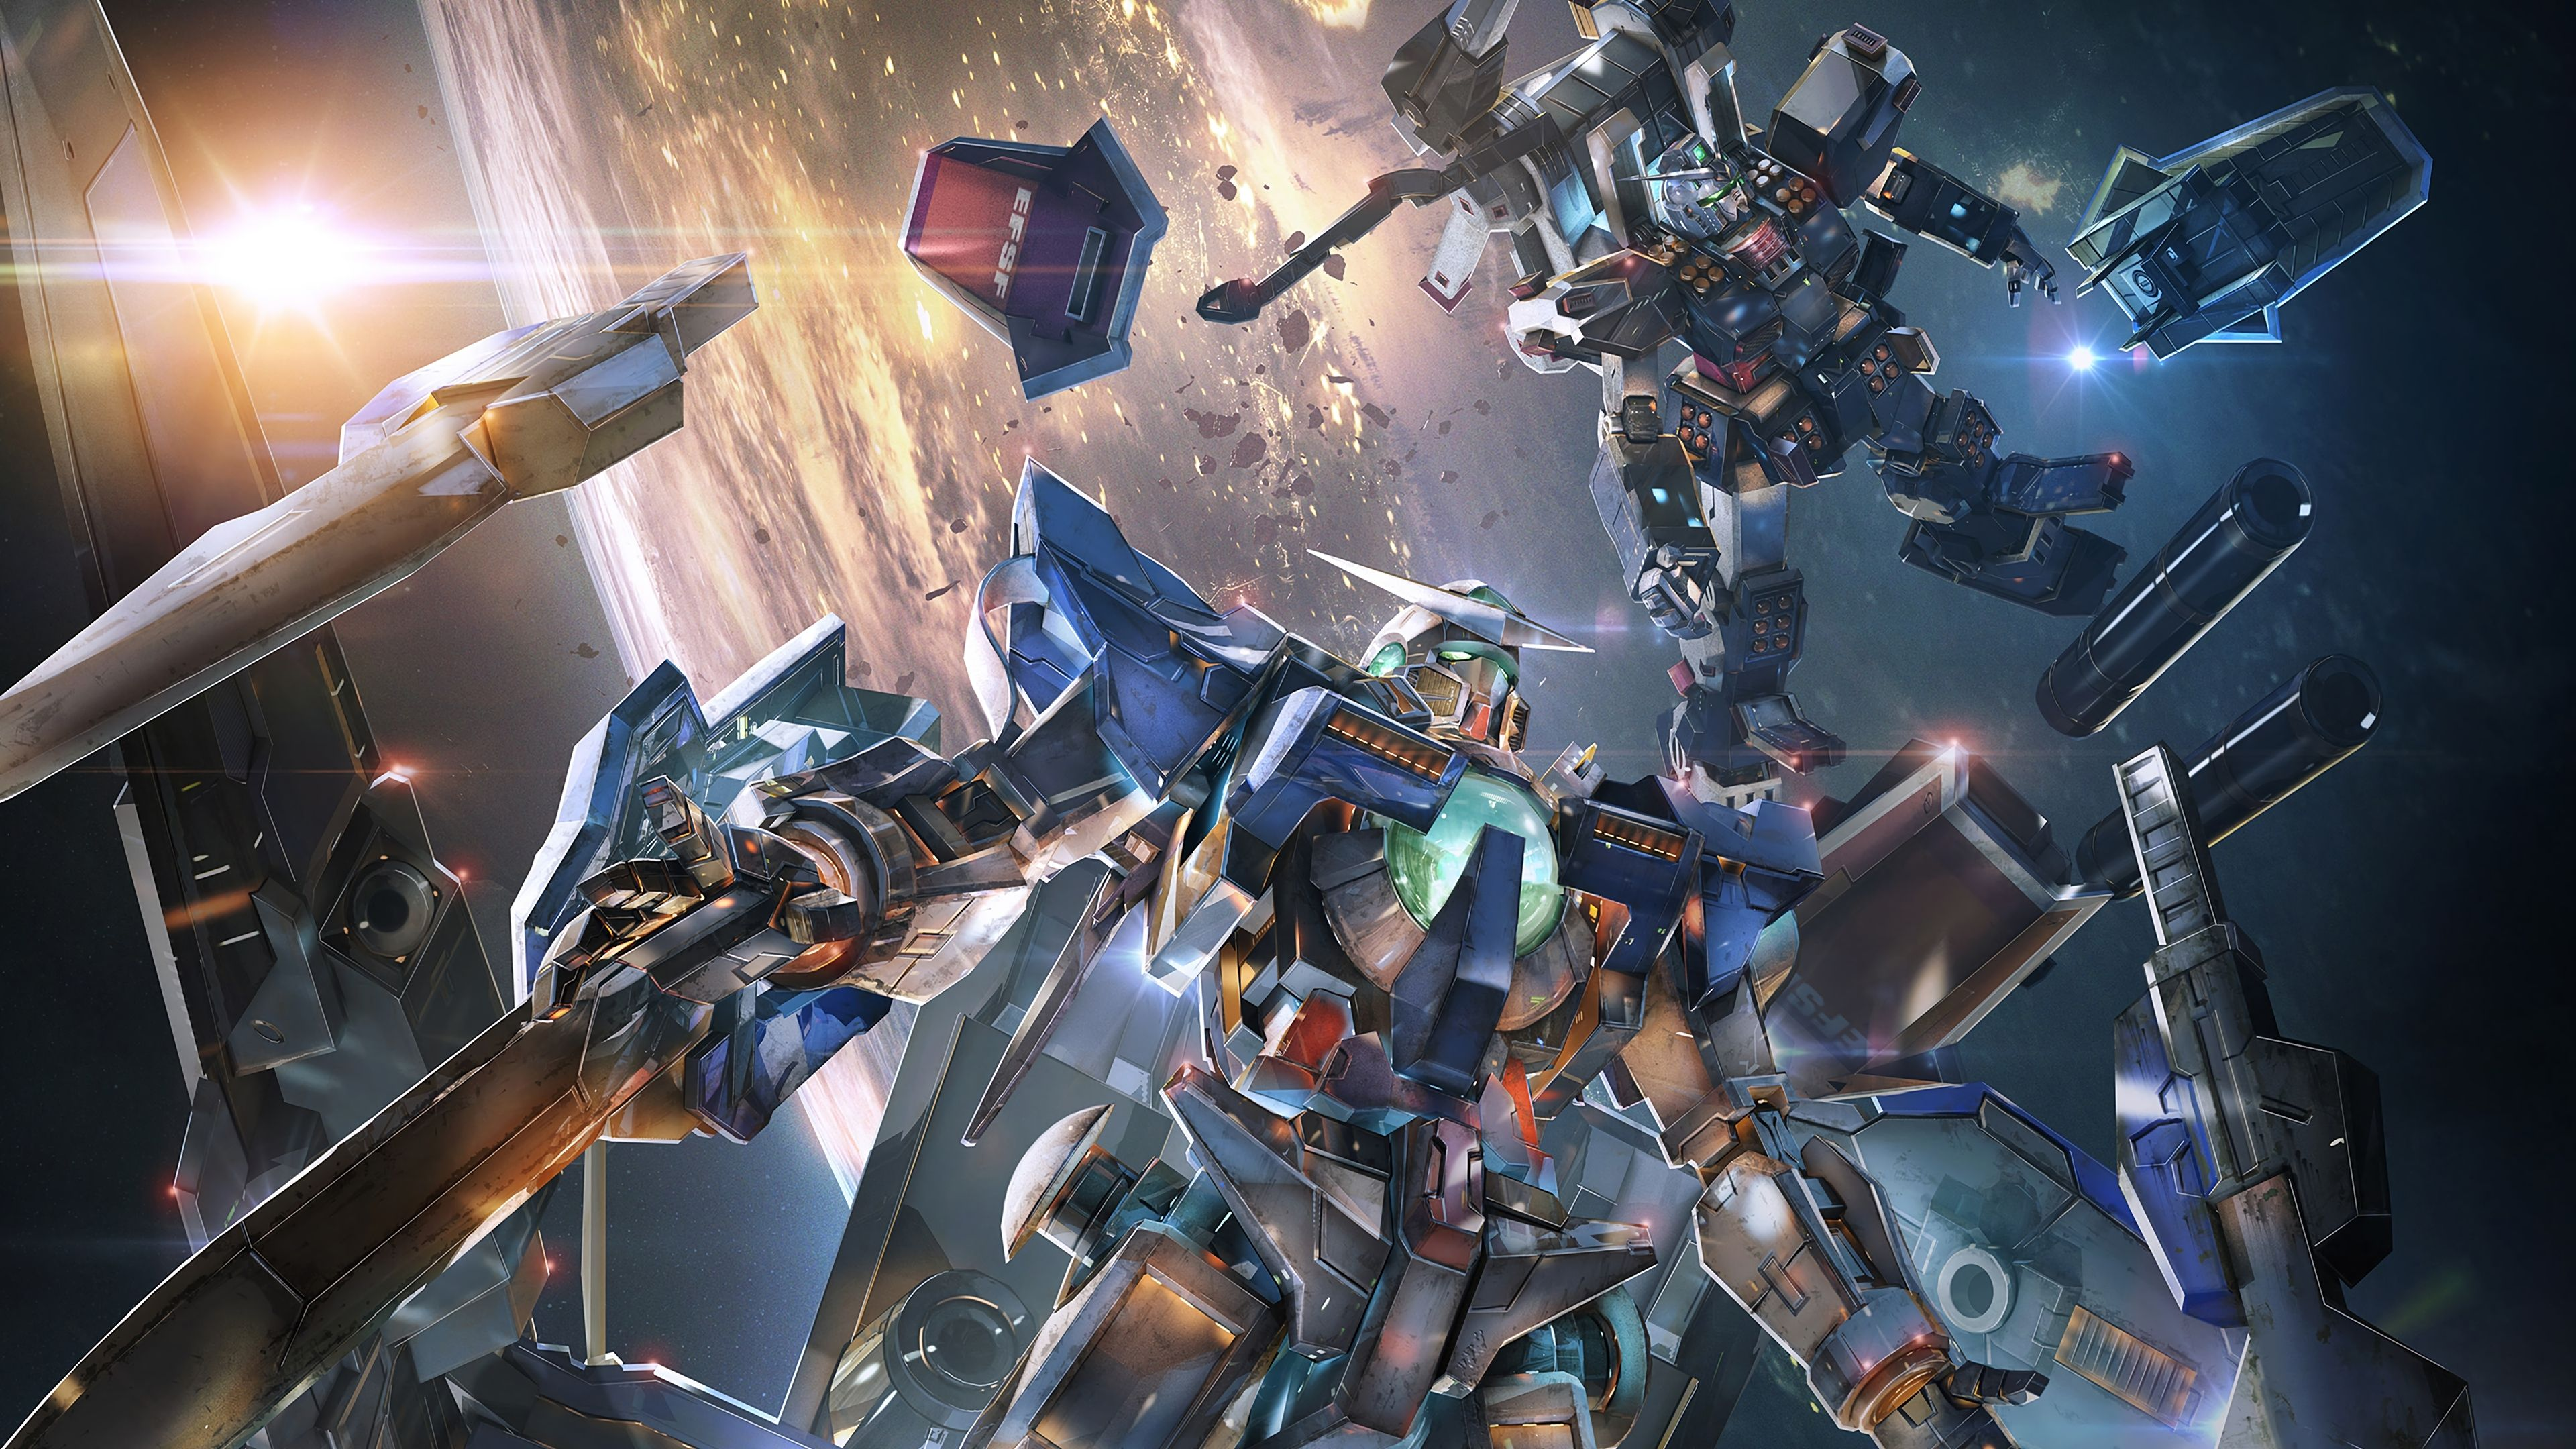 Nice Gundam Versus 4k Playstation 4 Ps4 Game 3840x2160 Wallpaper 3840x2160 Wallpaper Unicorn Wallpaper Gundam Wallpapers